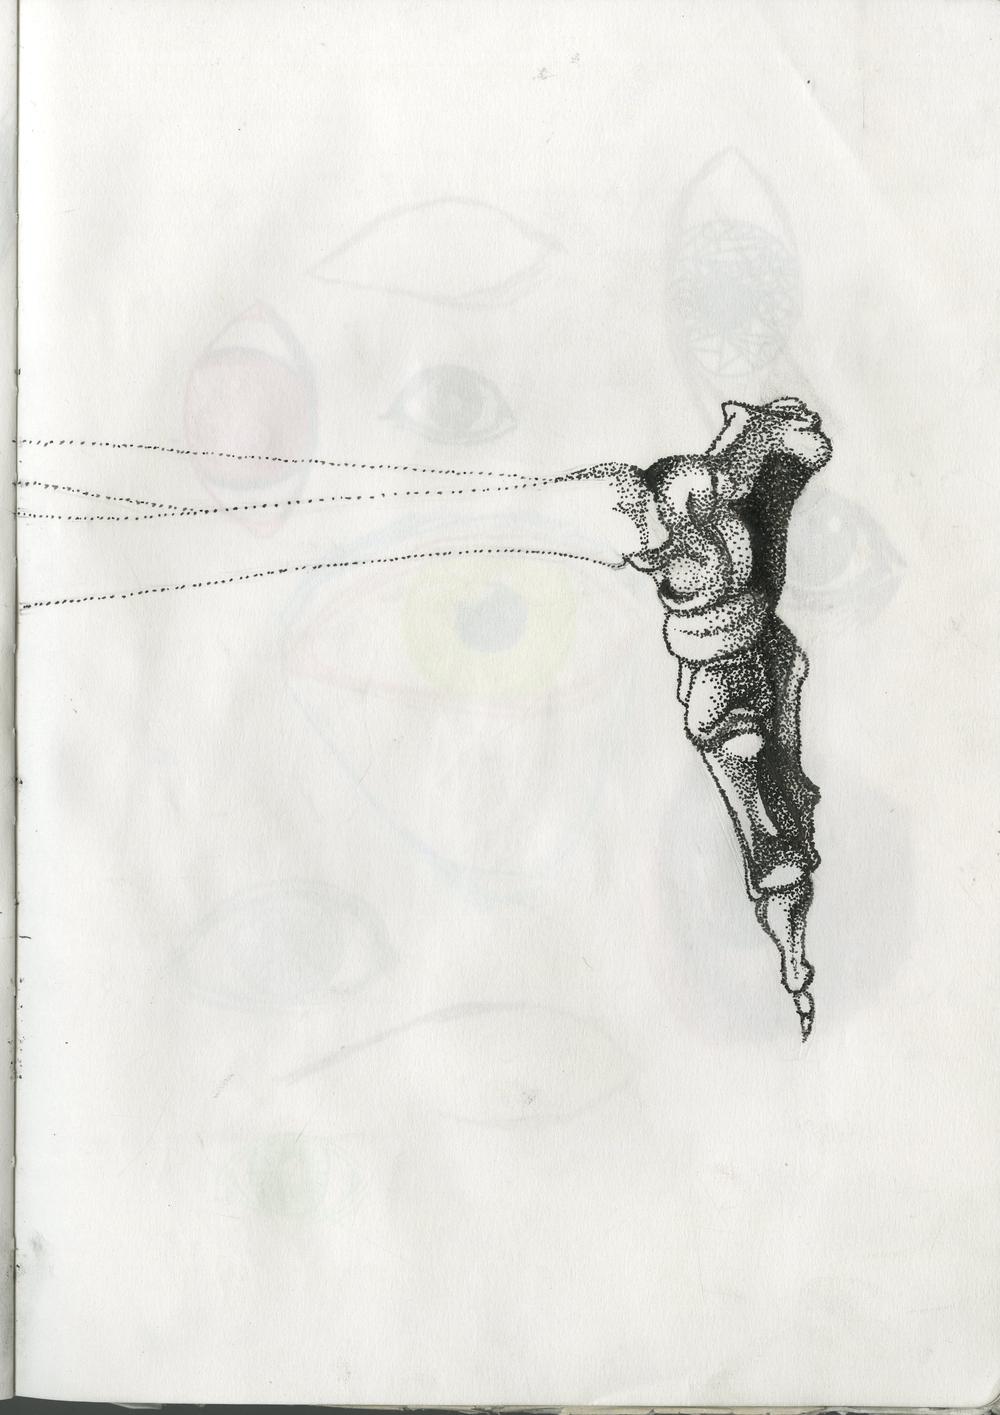 mzalesky-bonefoot008.jpg